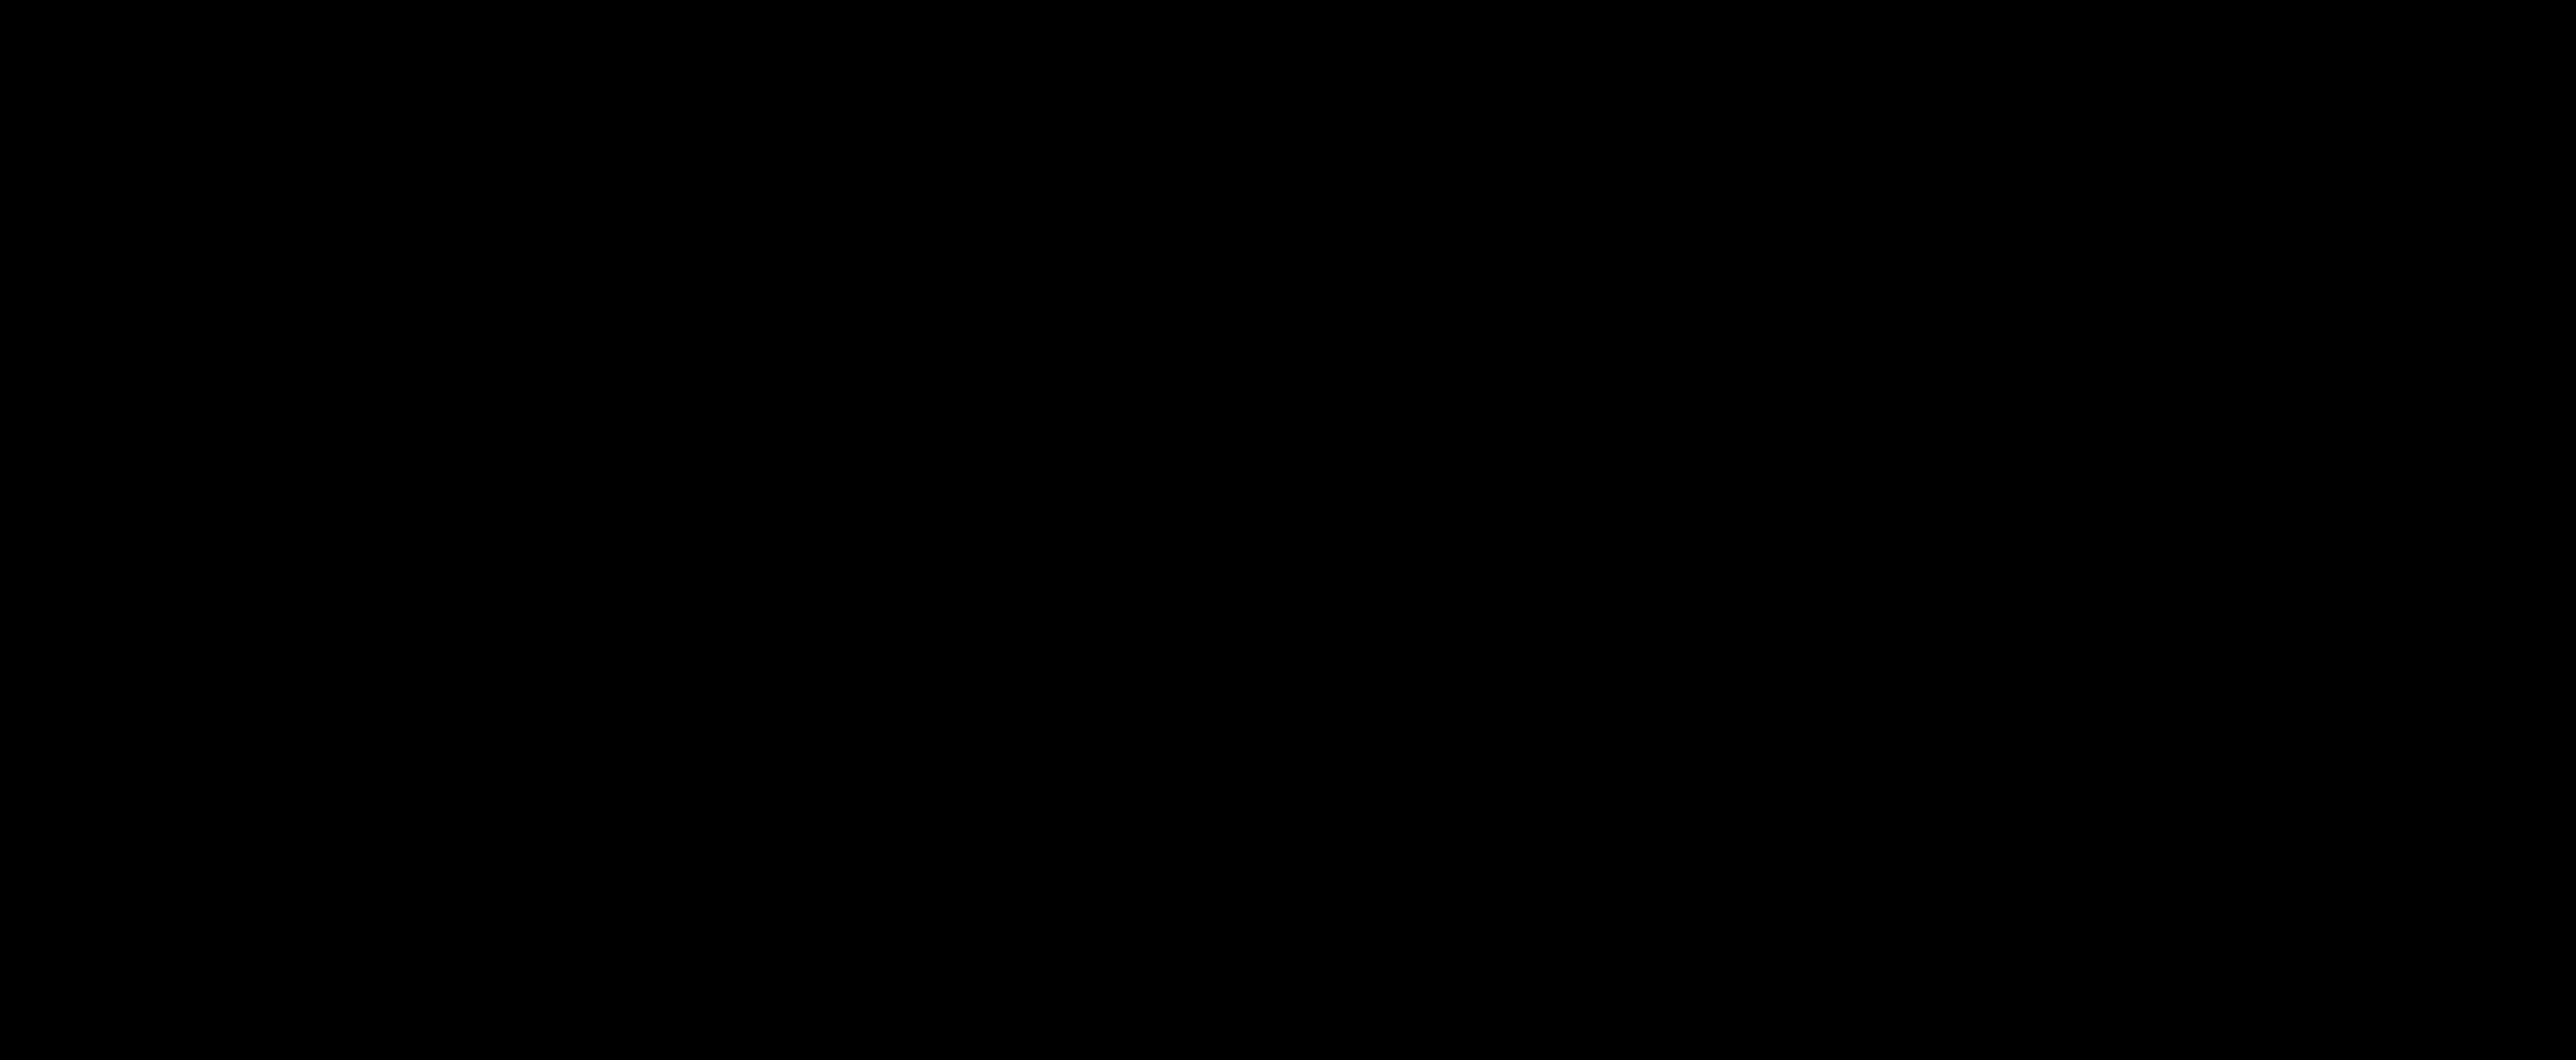 3-AZIDOPROPYLTRIETHOXYSILANE